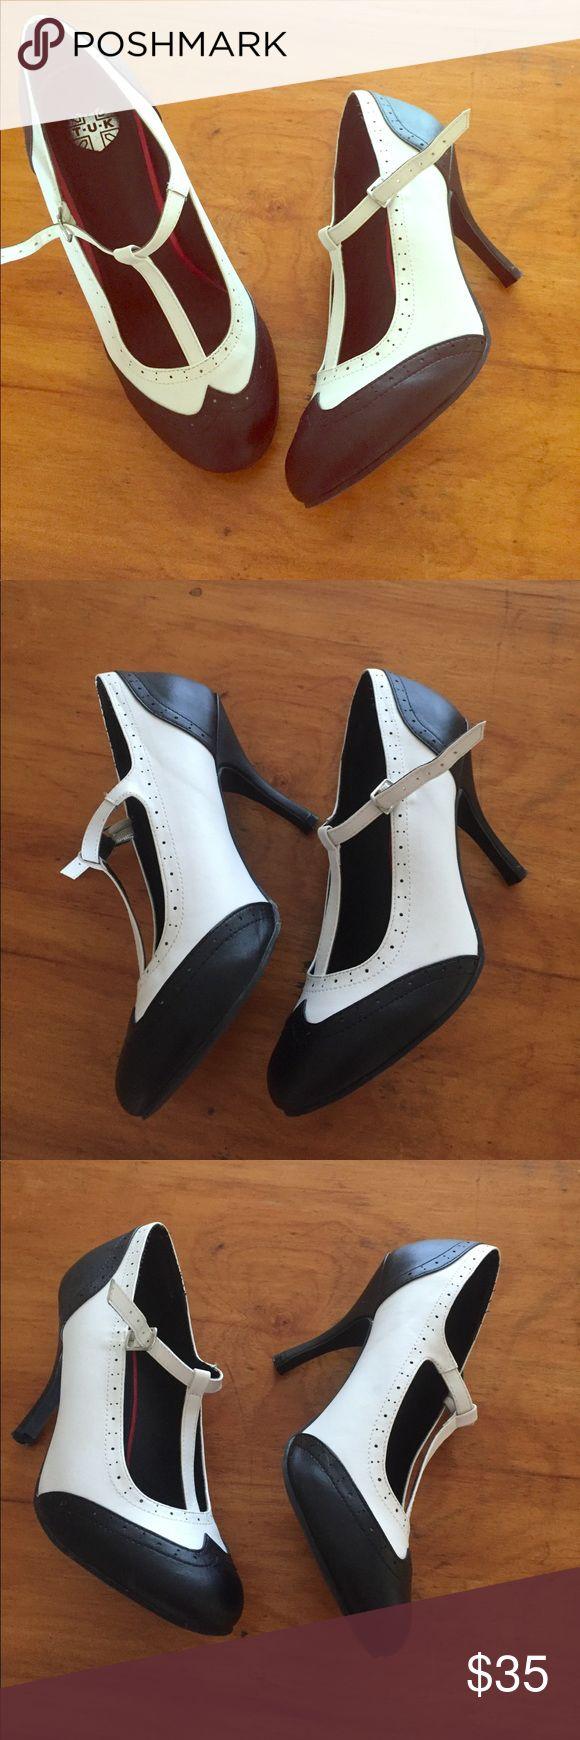 Saddle oxford heels size 10 women's blue white ❤️ Great like new heels size 10 Tuk brand tuk Shoes Heels